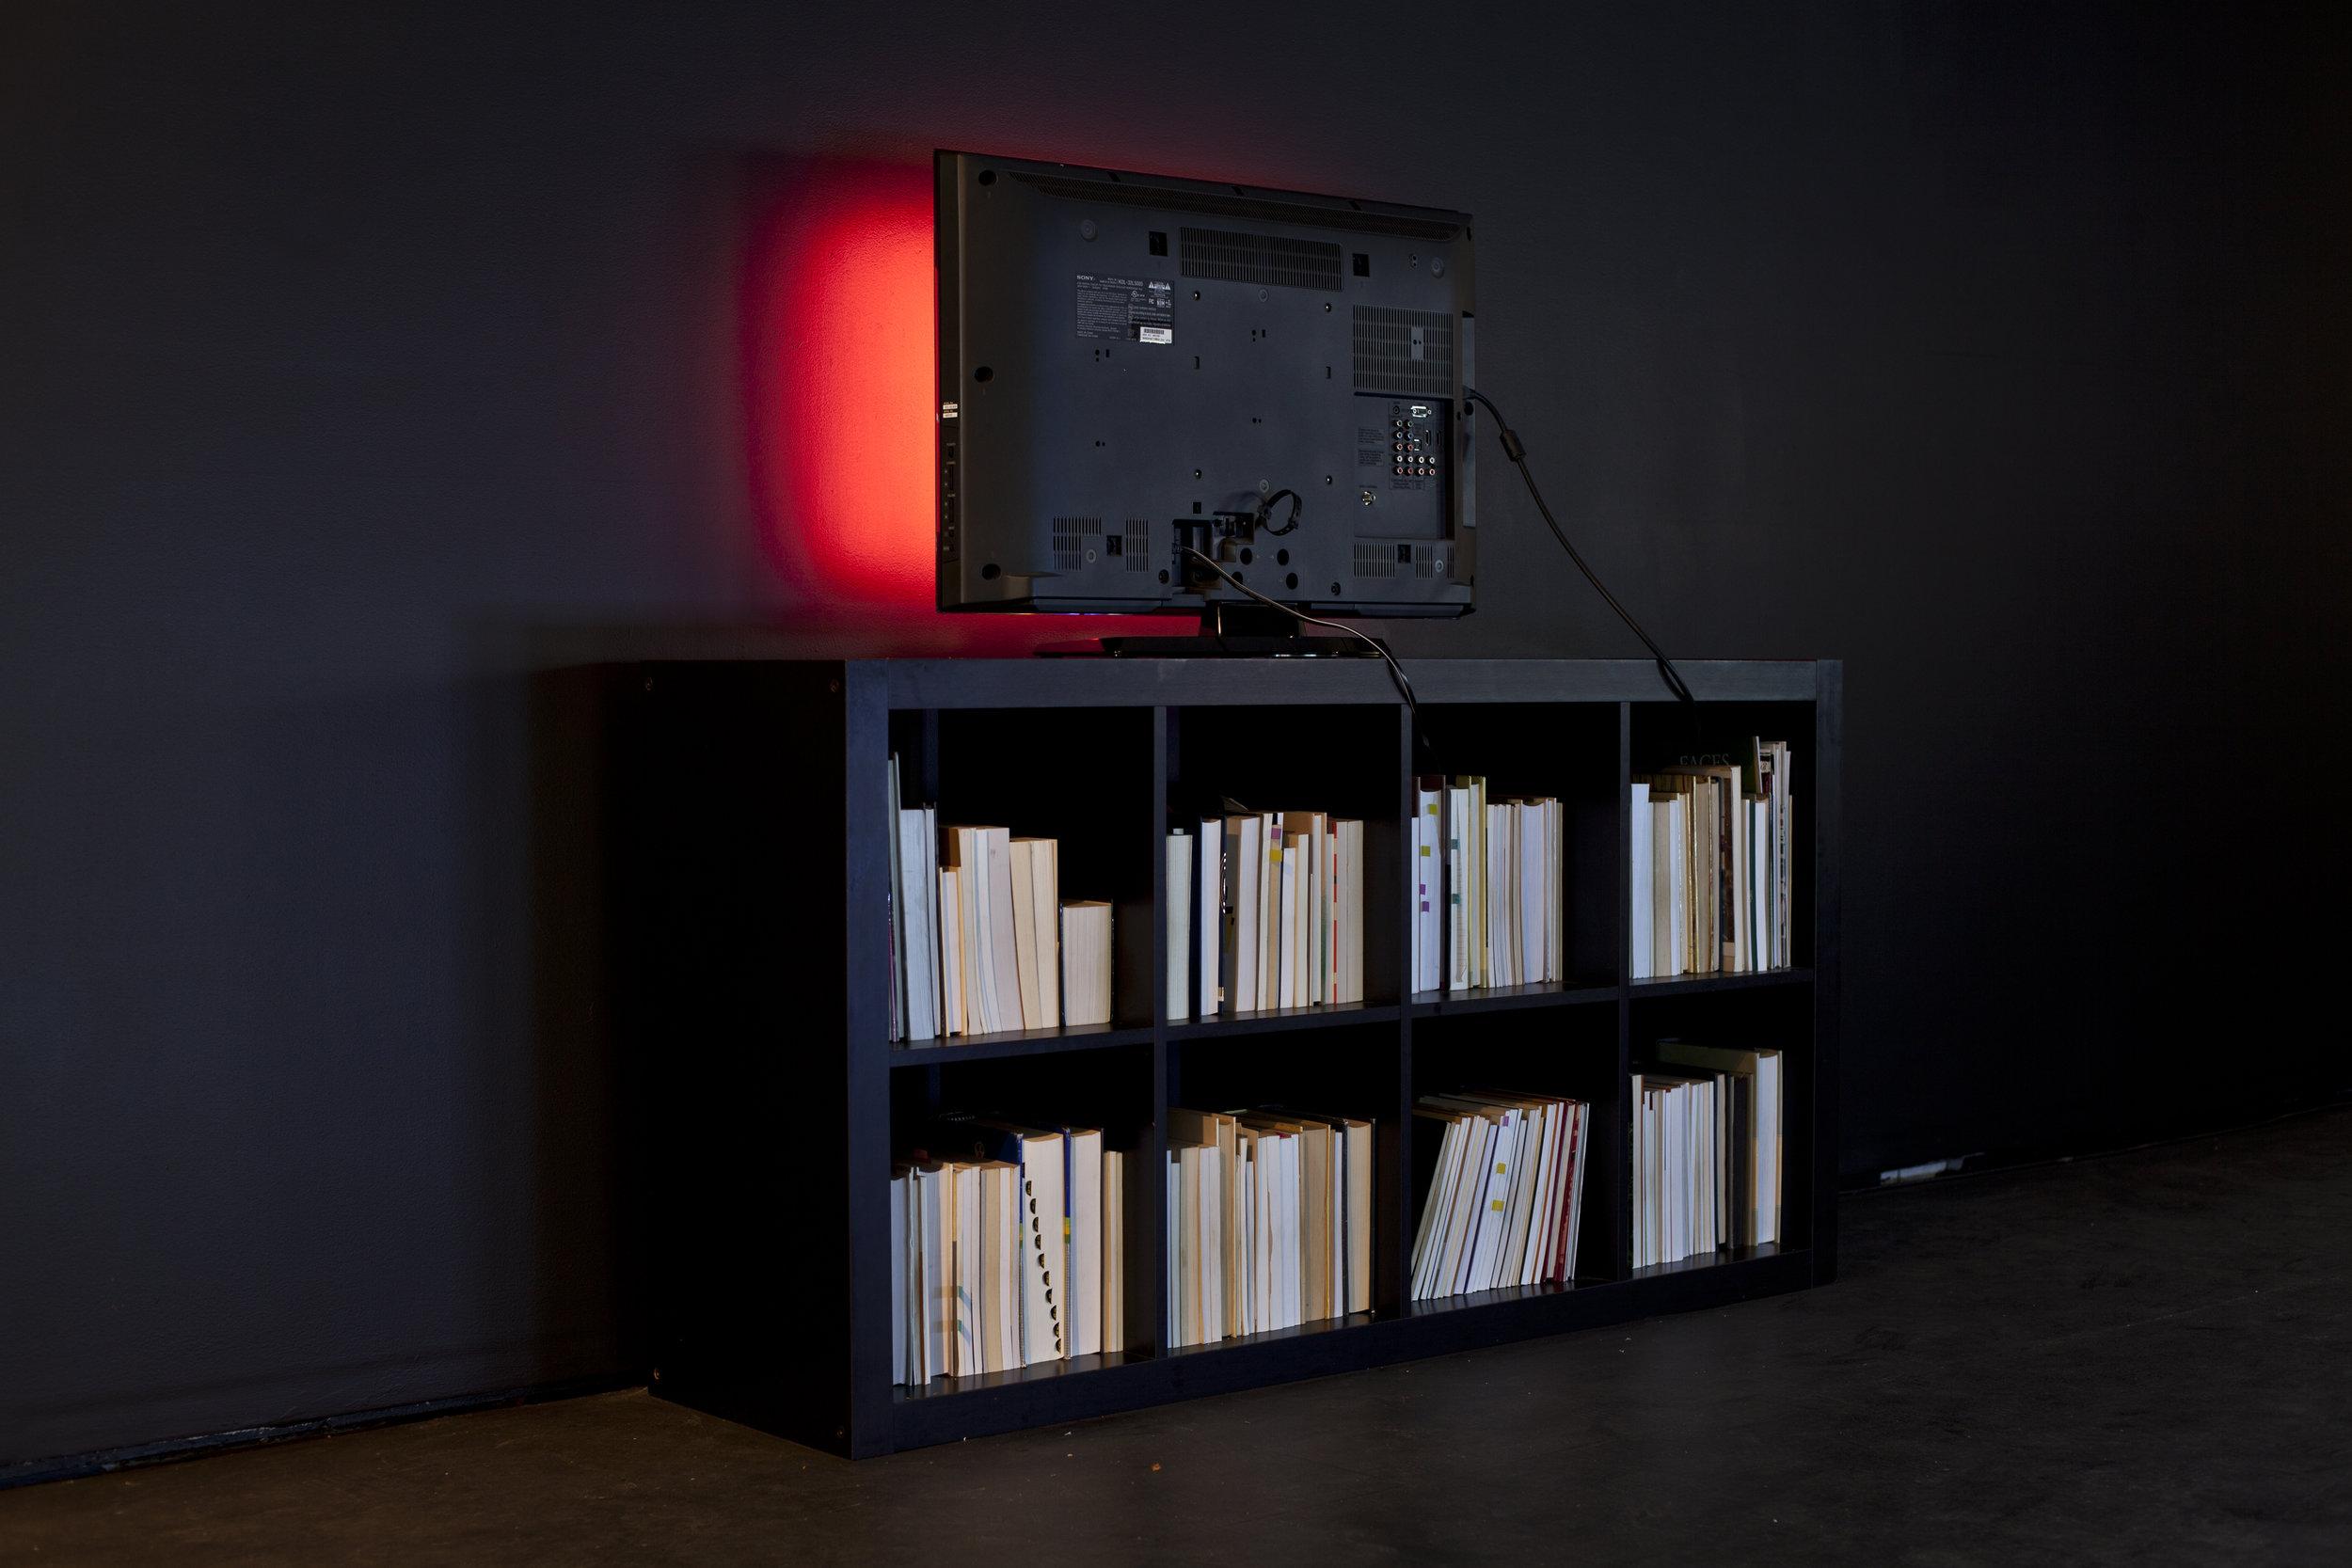 Installation view TV Monitor, Digital Image, Black IKEA Wooden Bookshelf, Book, Silver Mirror, Black Paint.